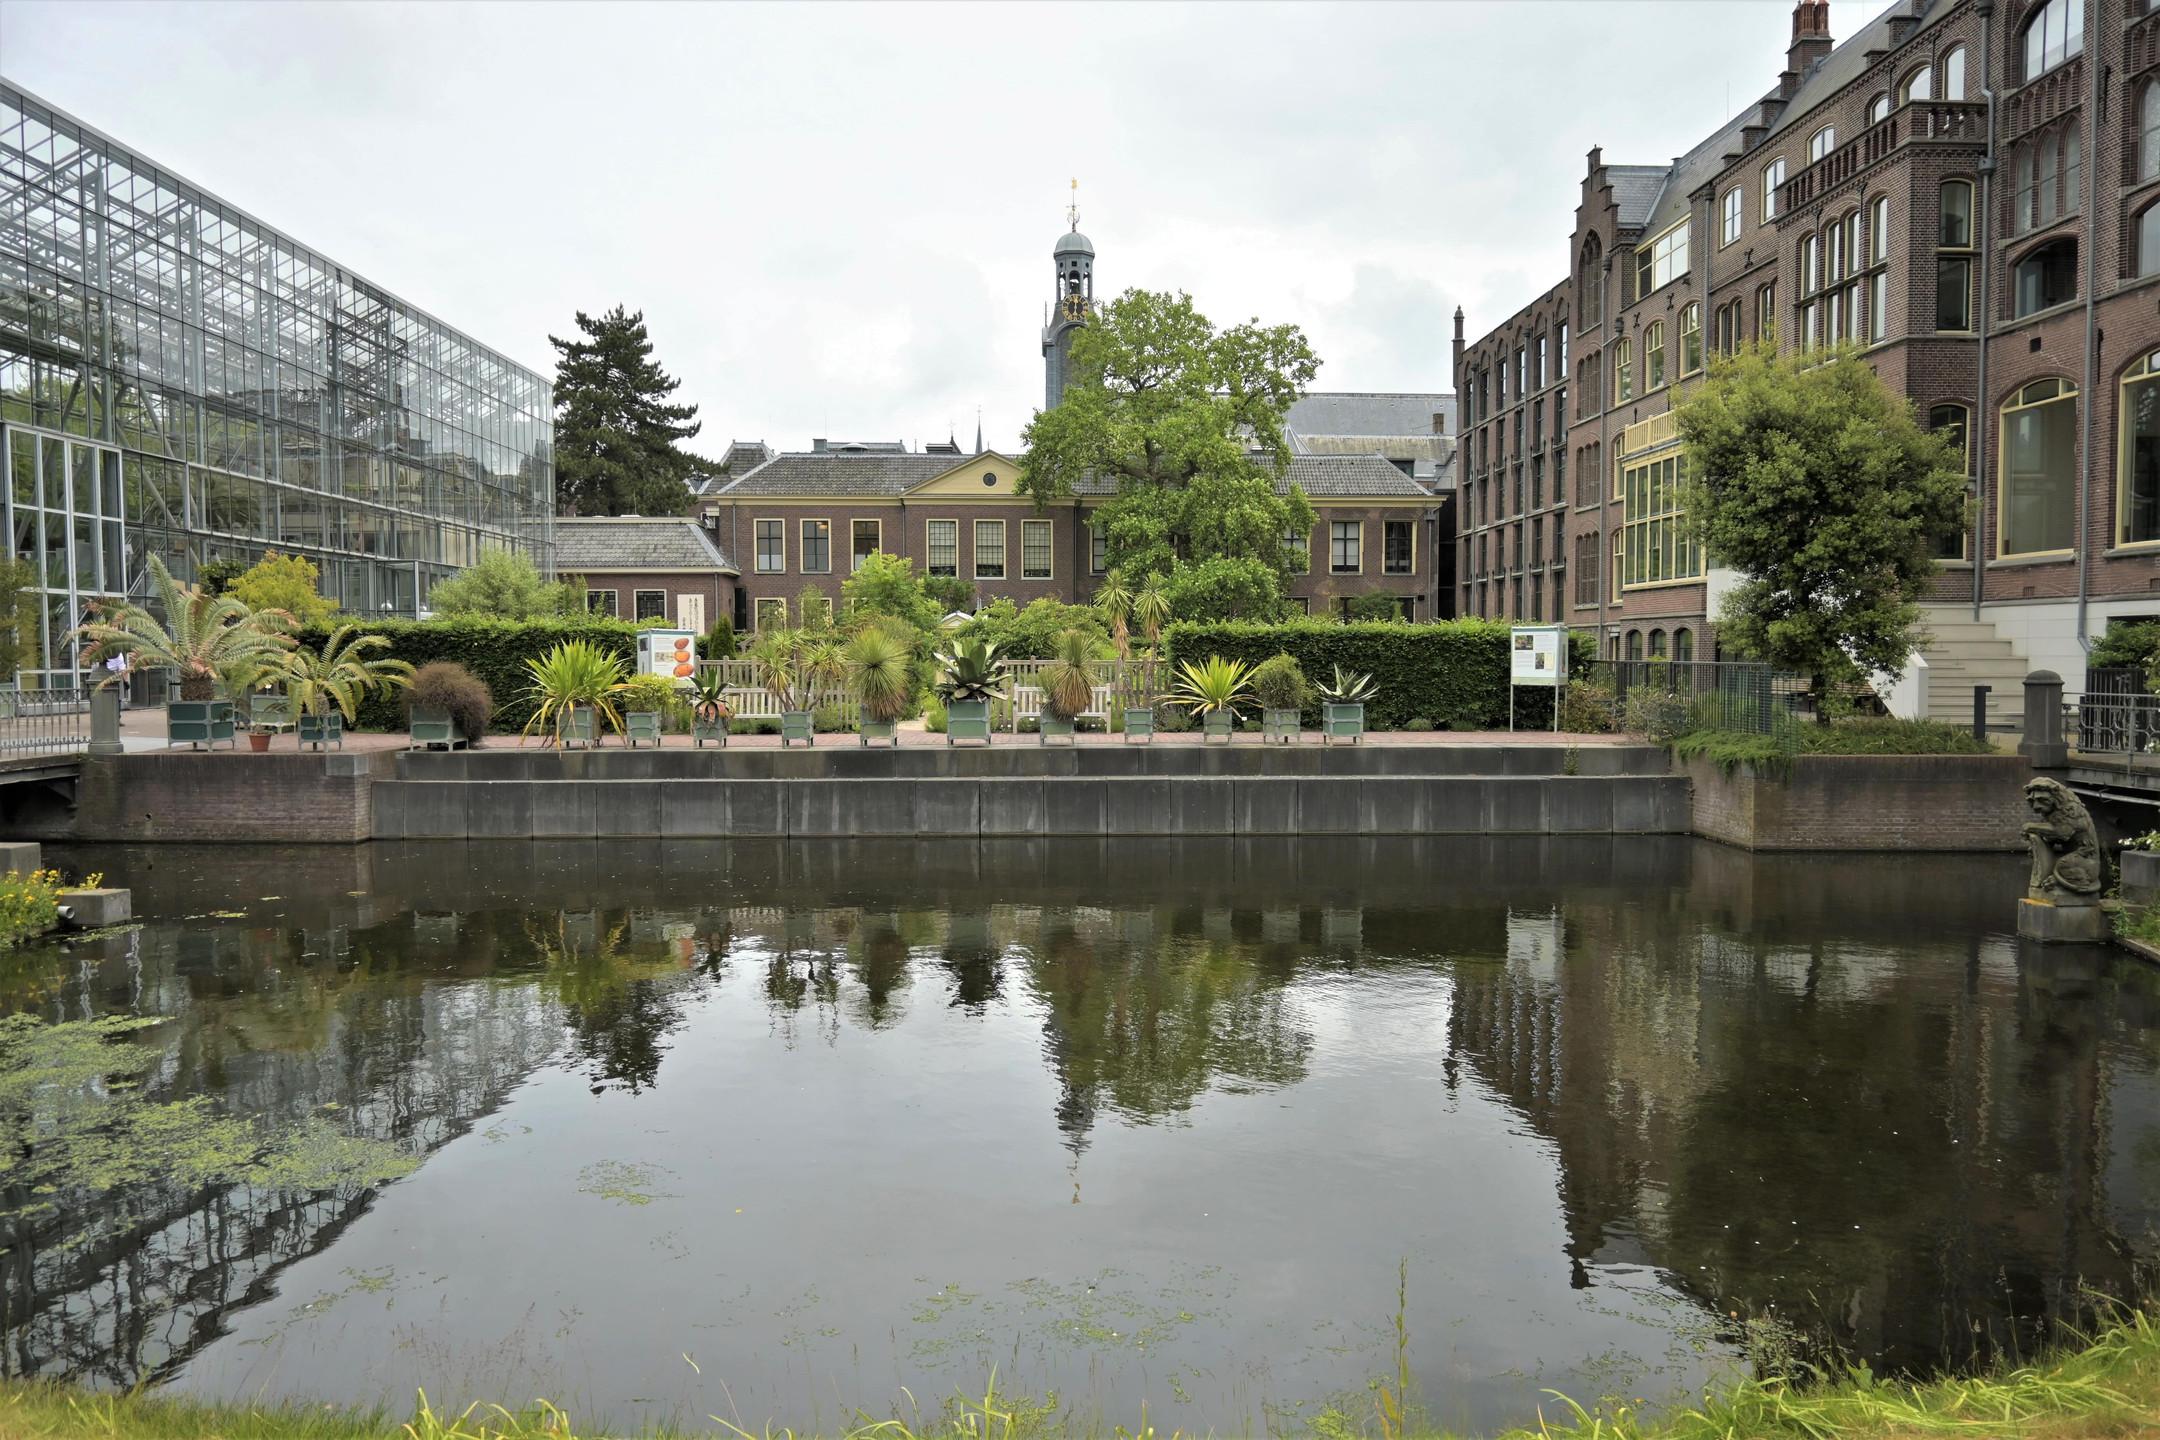 Hortus Botanicus Leiden Netherlands citytrip